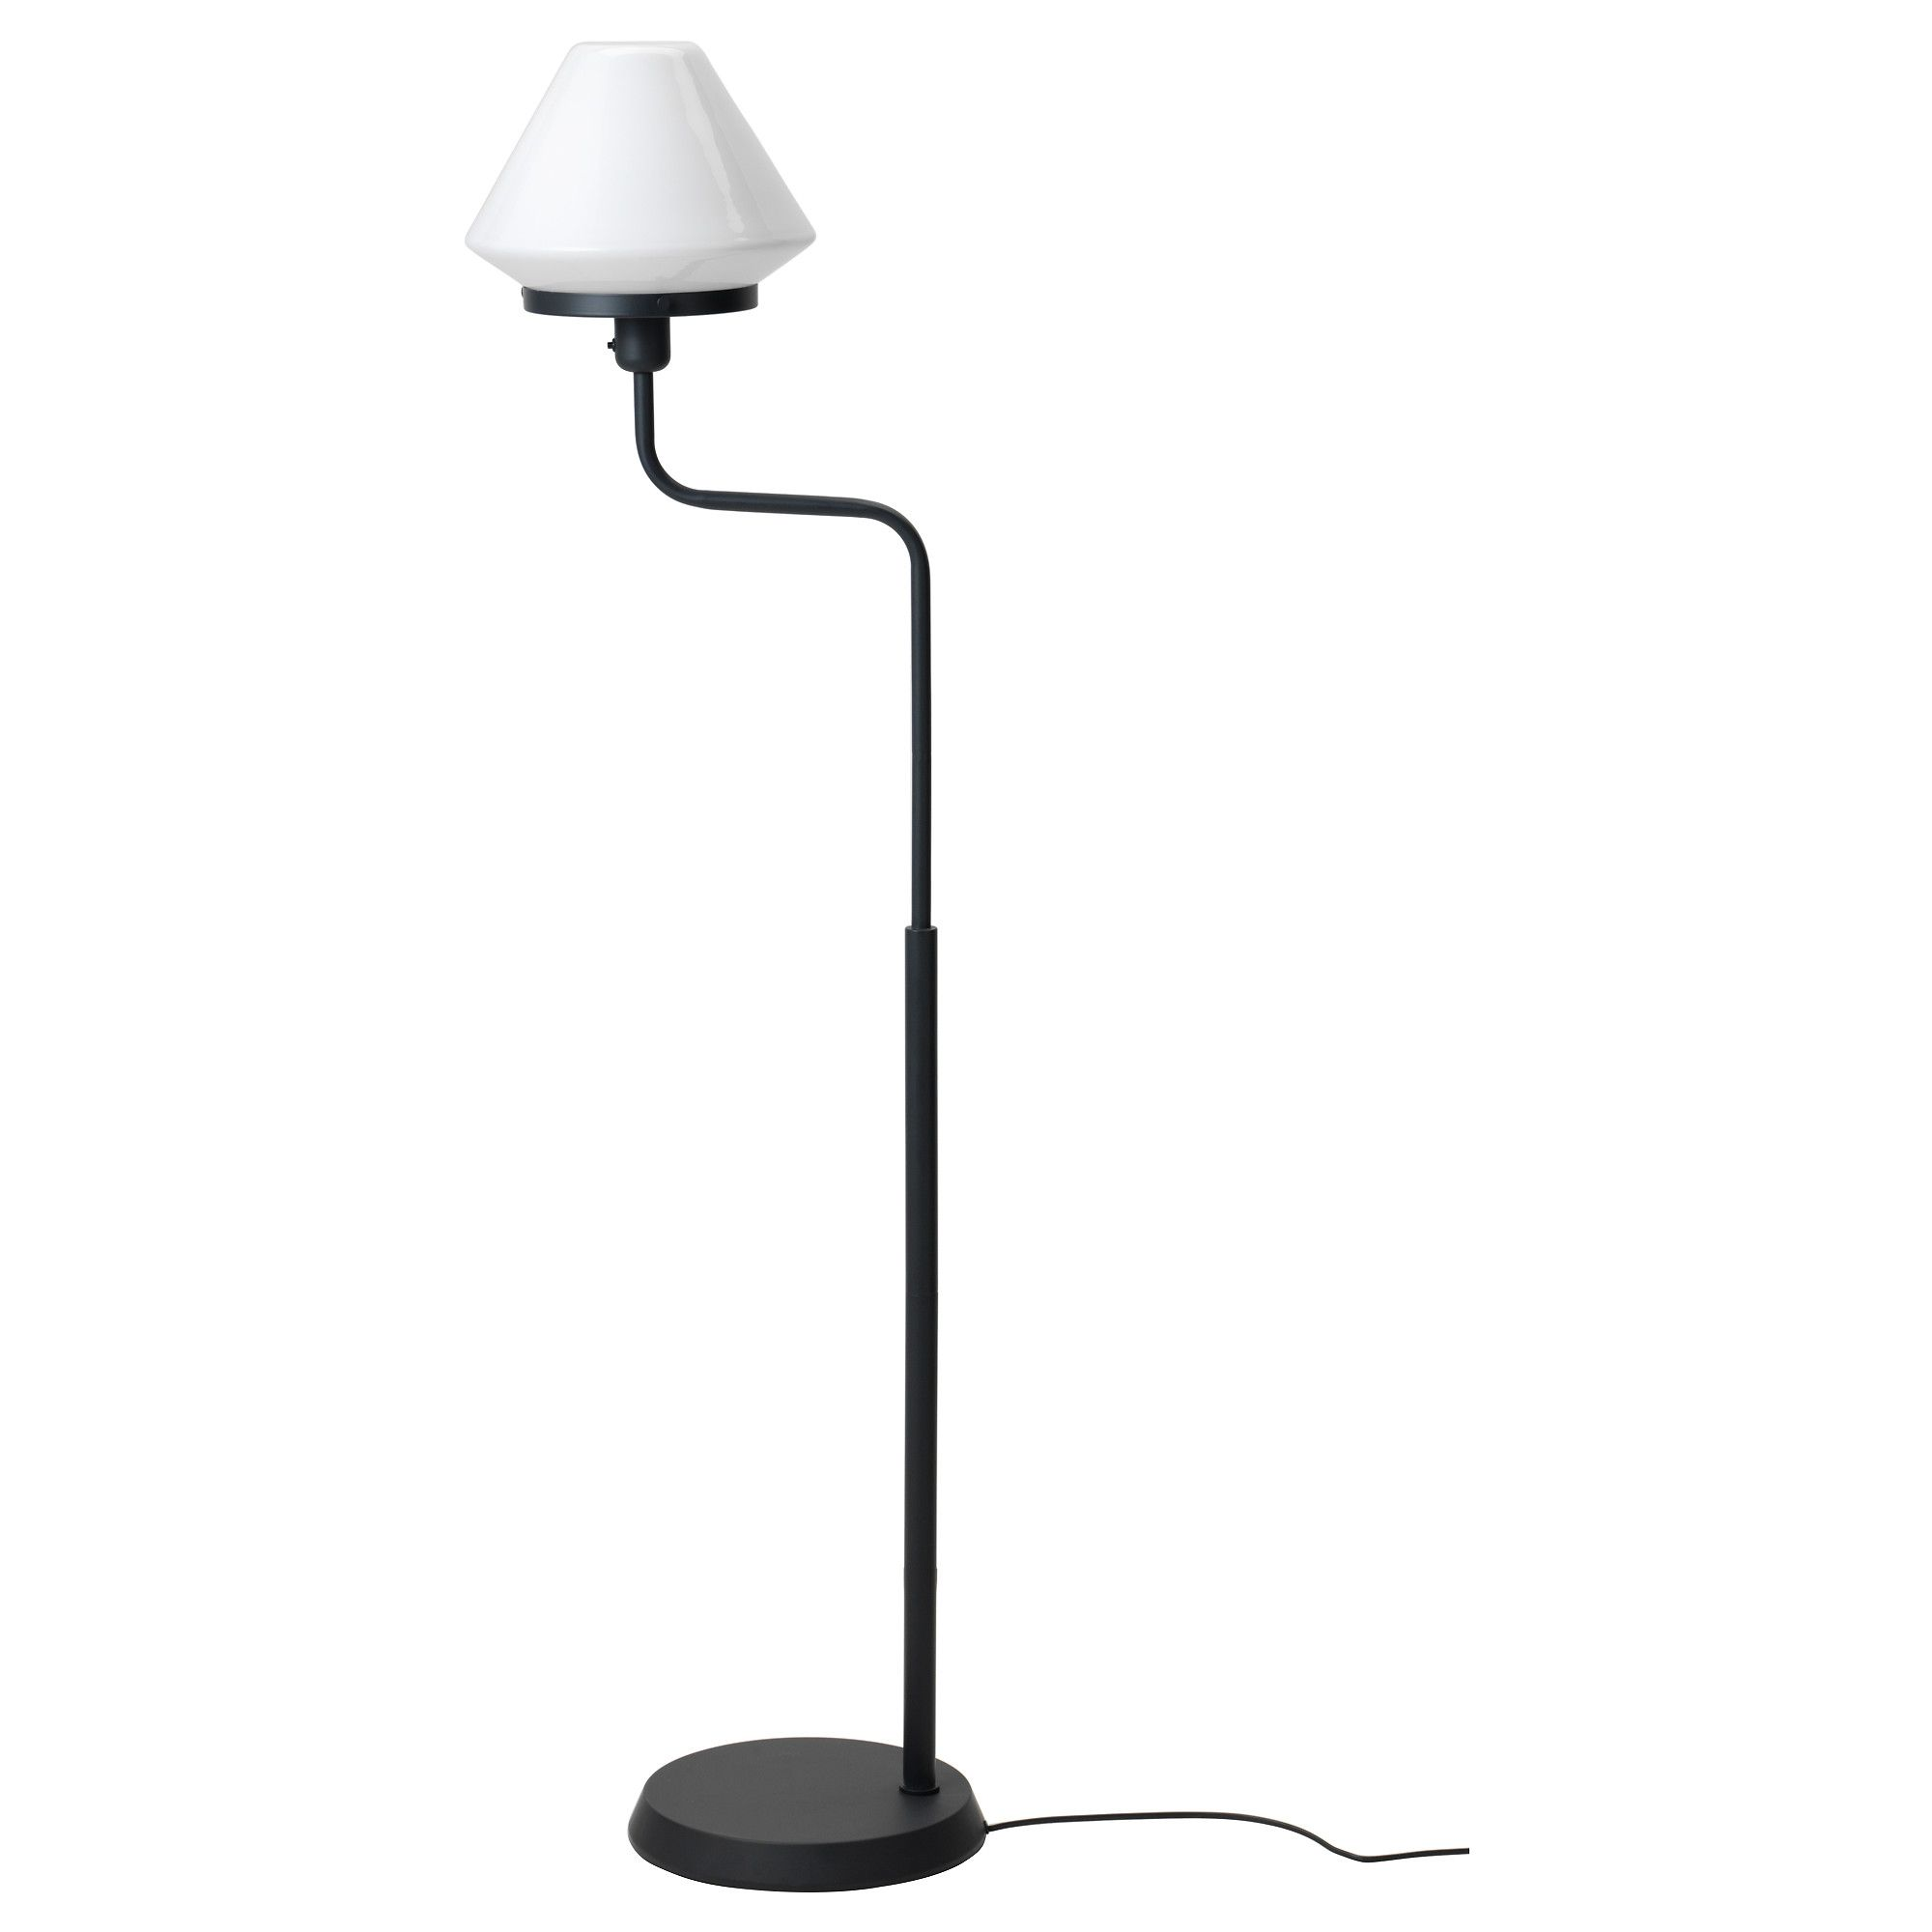 IKEA LVNGEN Floor lamp Gives a soft glowing light that